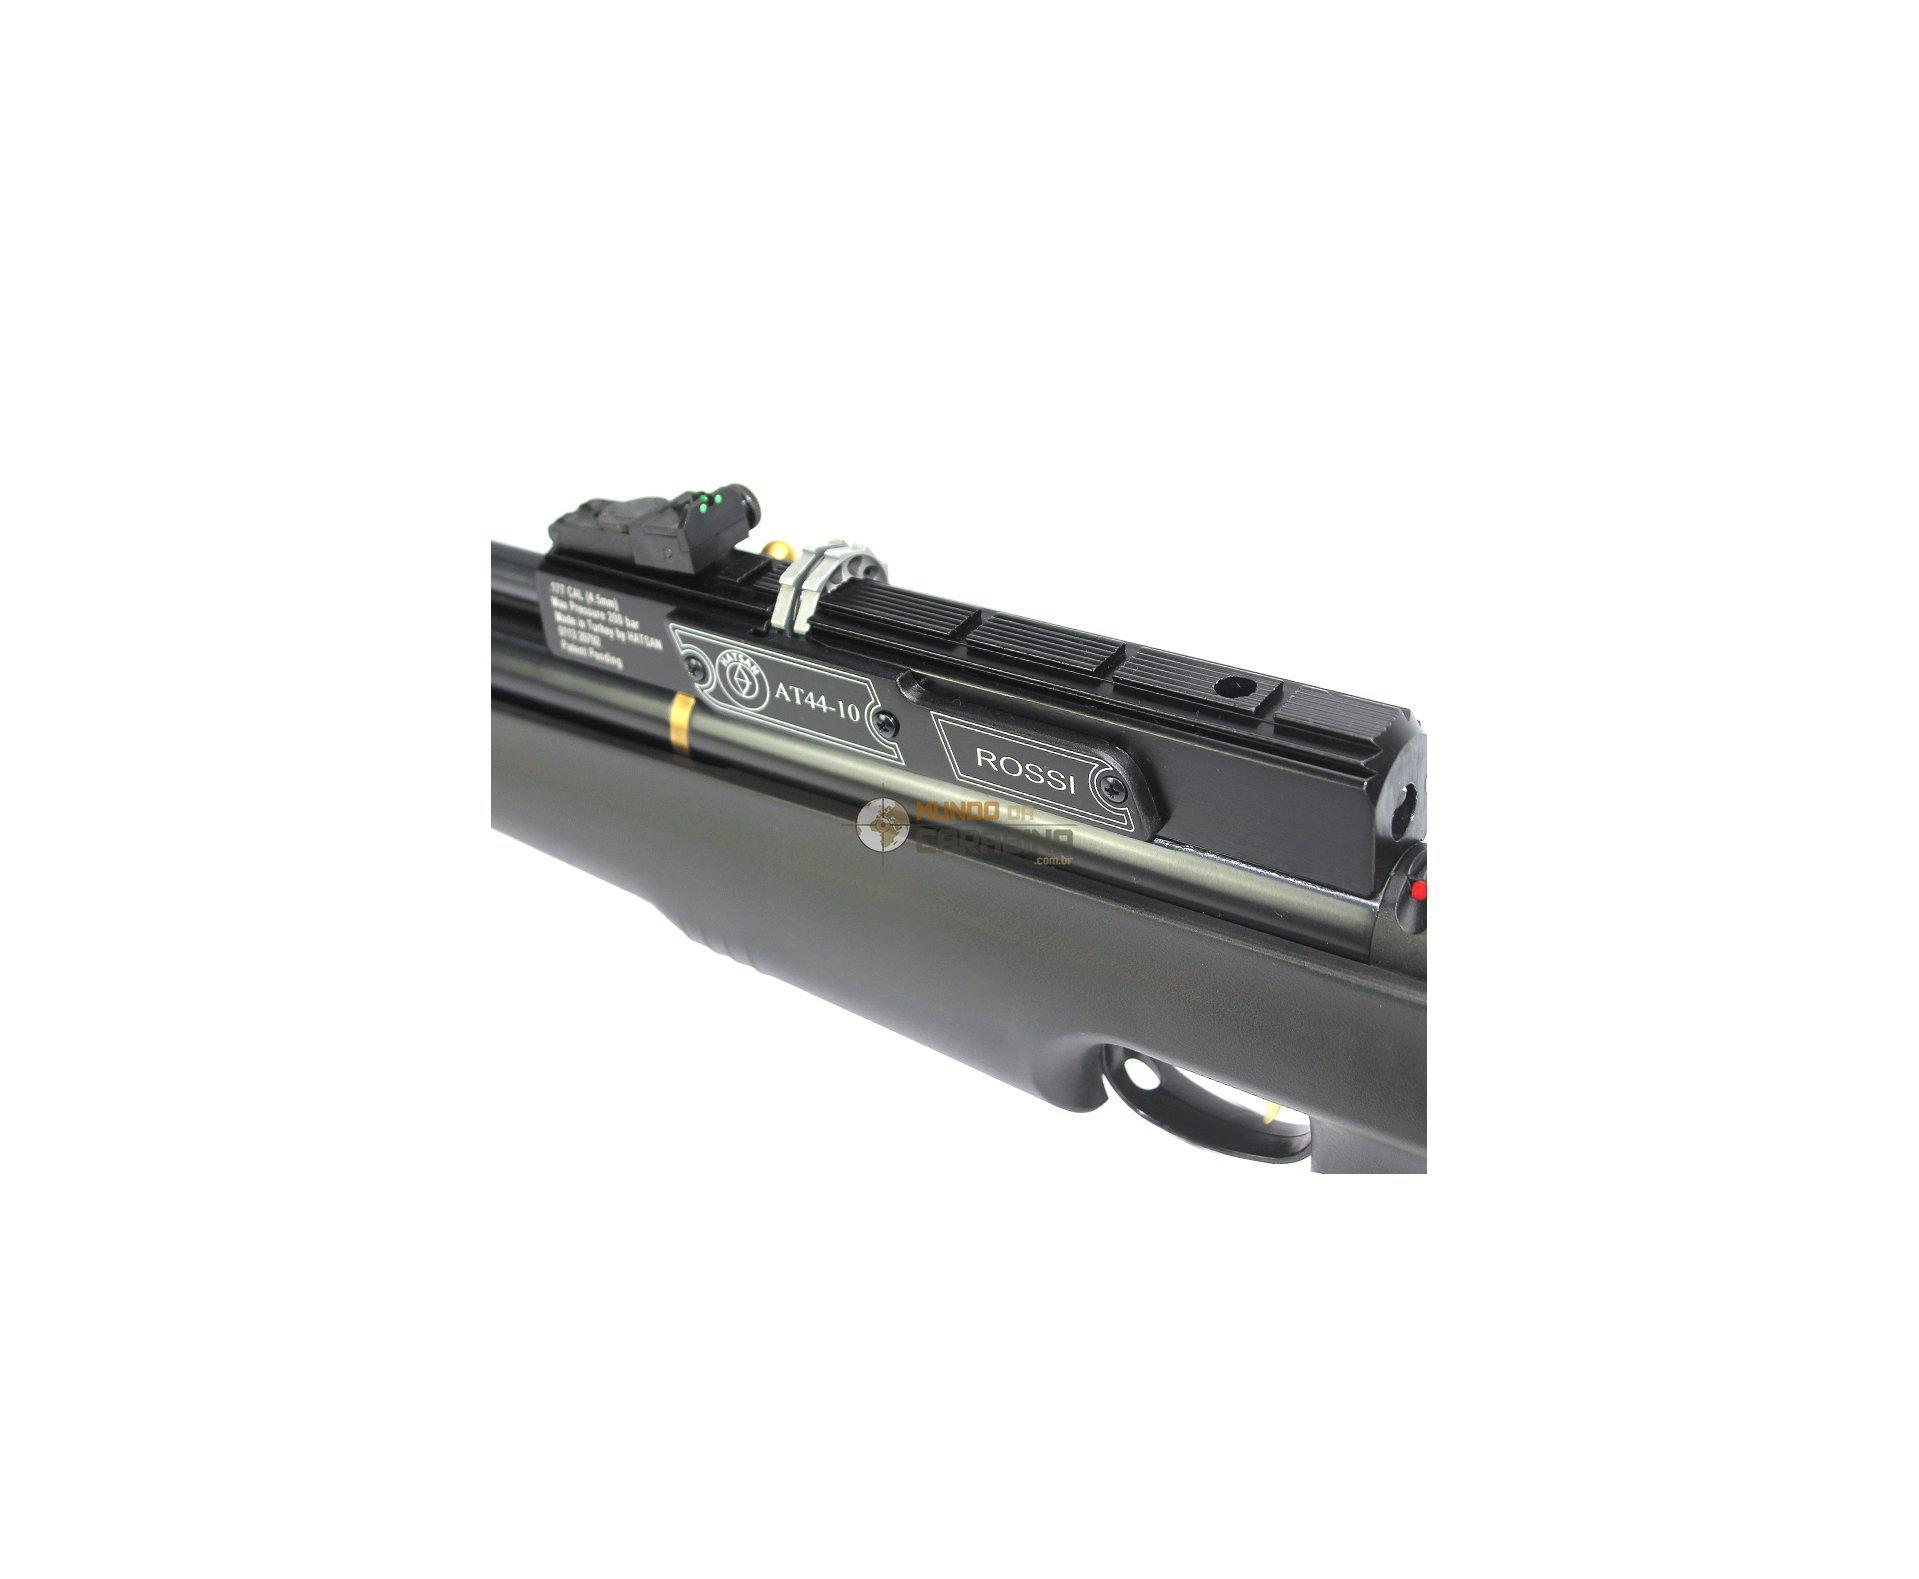 "Carabina De Pressão Hatsan Pcp At44-10 Cal 4,5mm + Capa 46"""